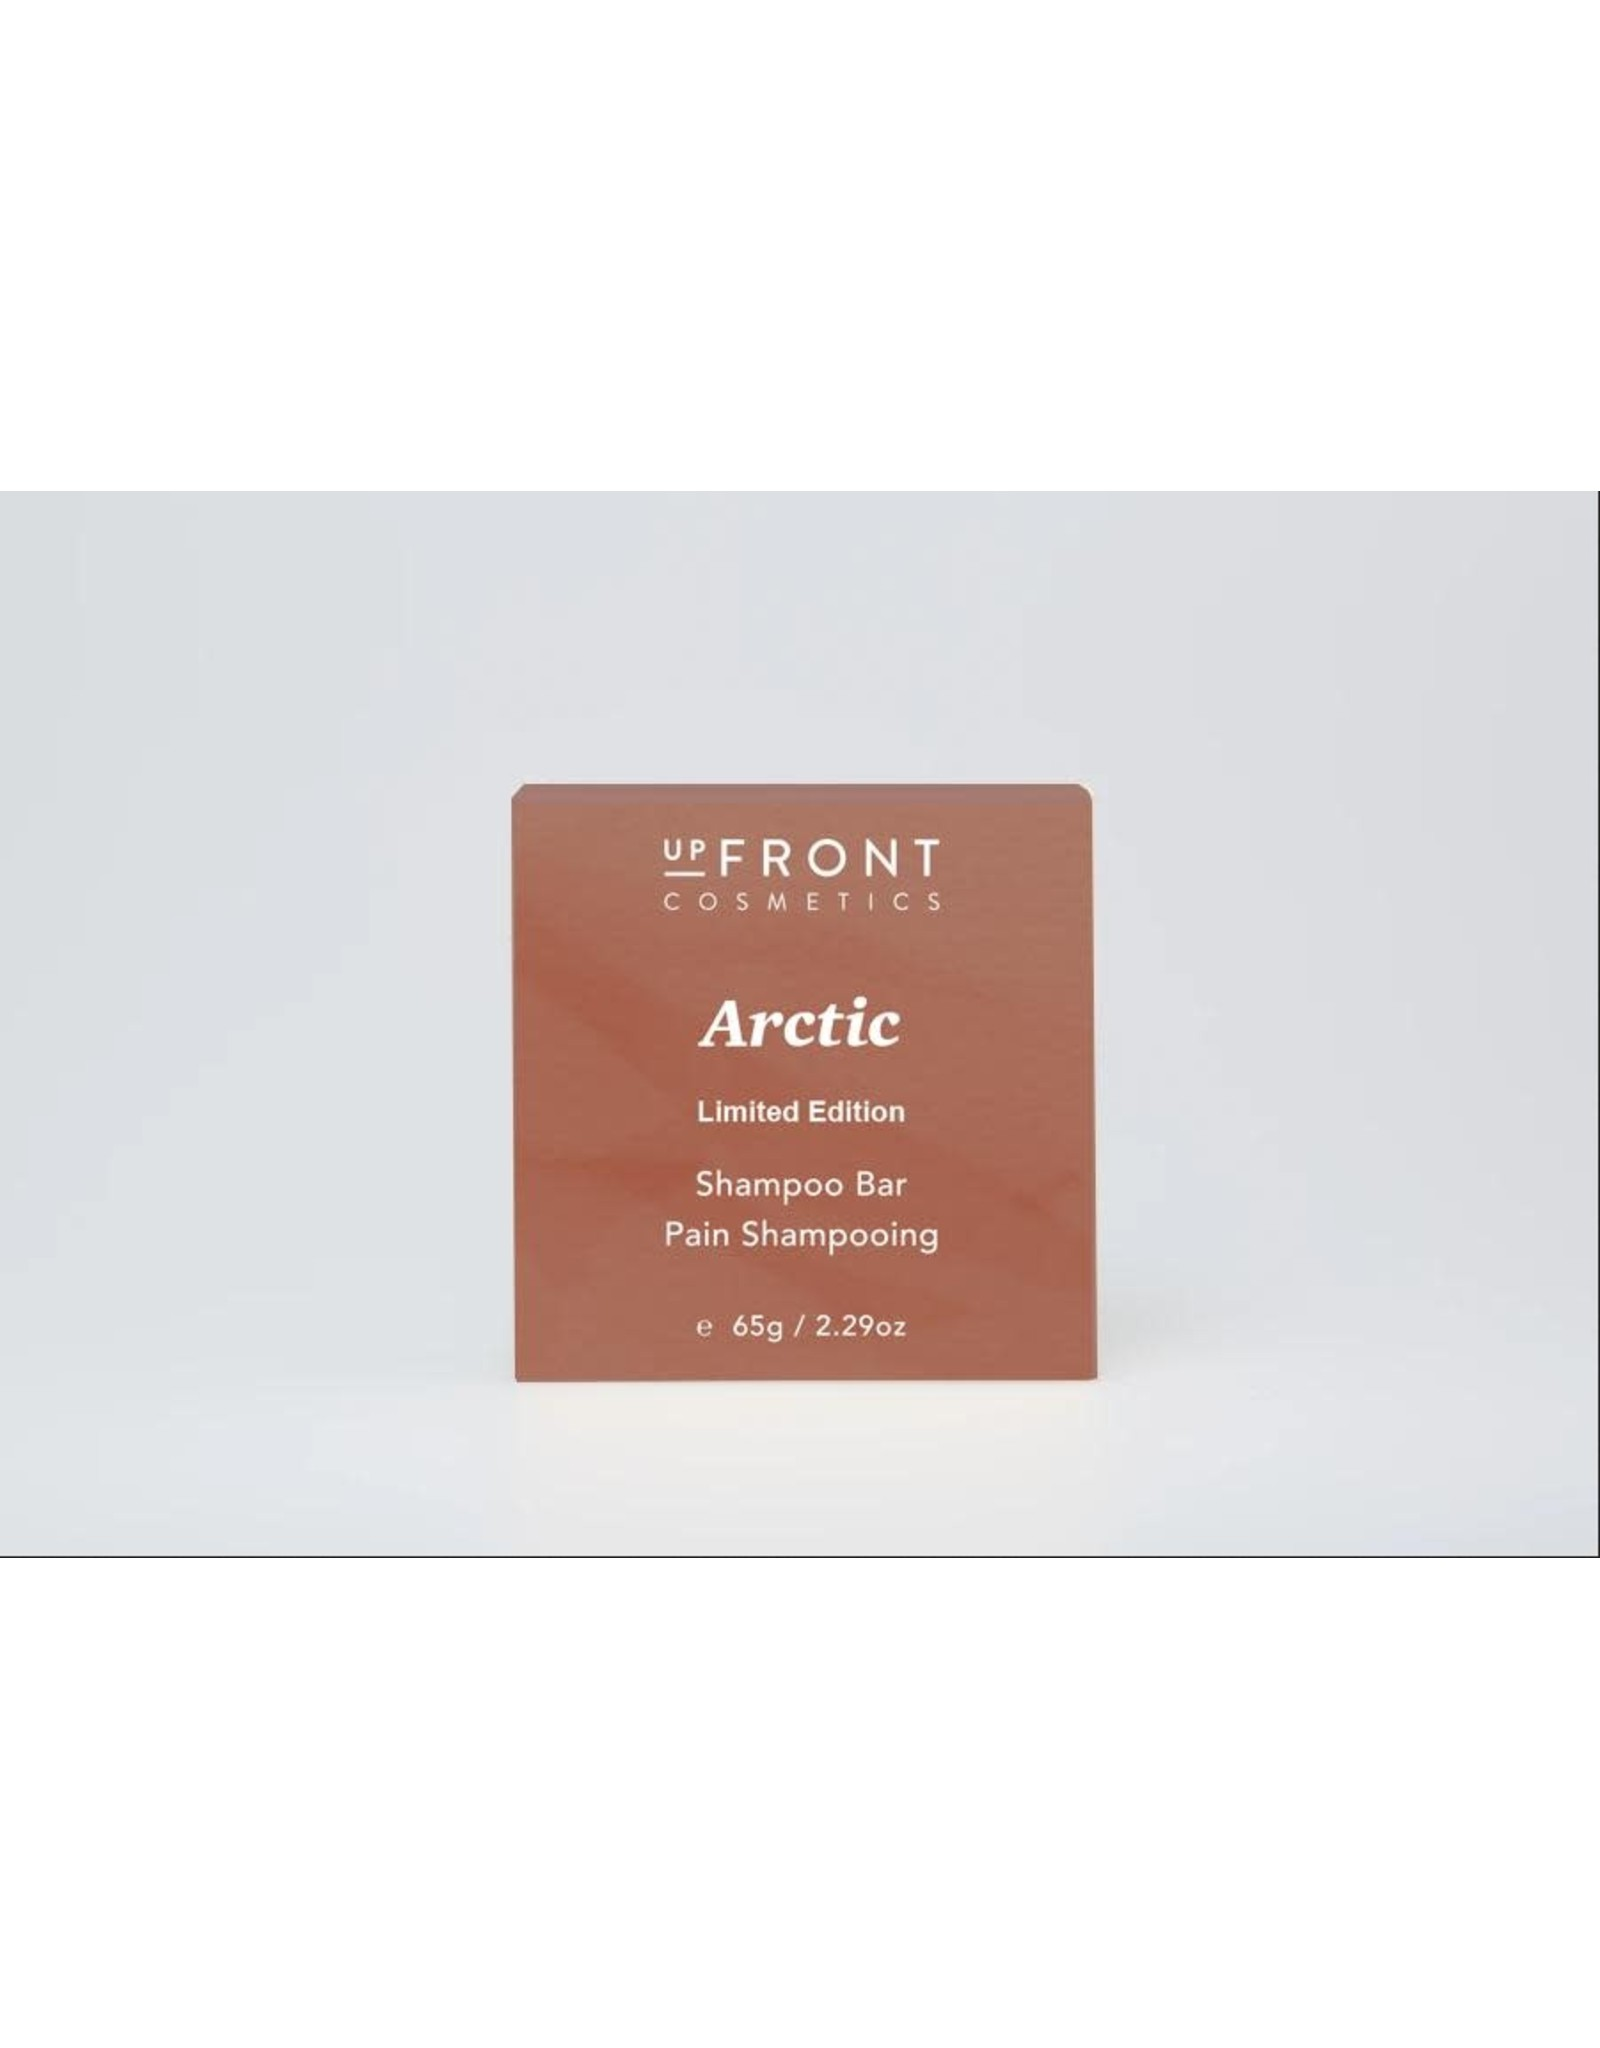 Upfront Cosmetics Limited Edition Shampoo Bar by Upfront Cosmetics